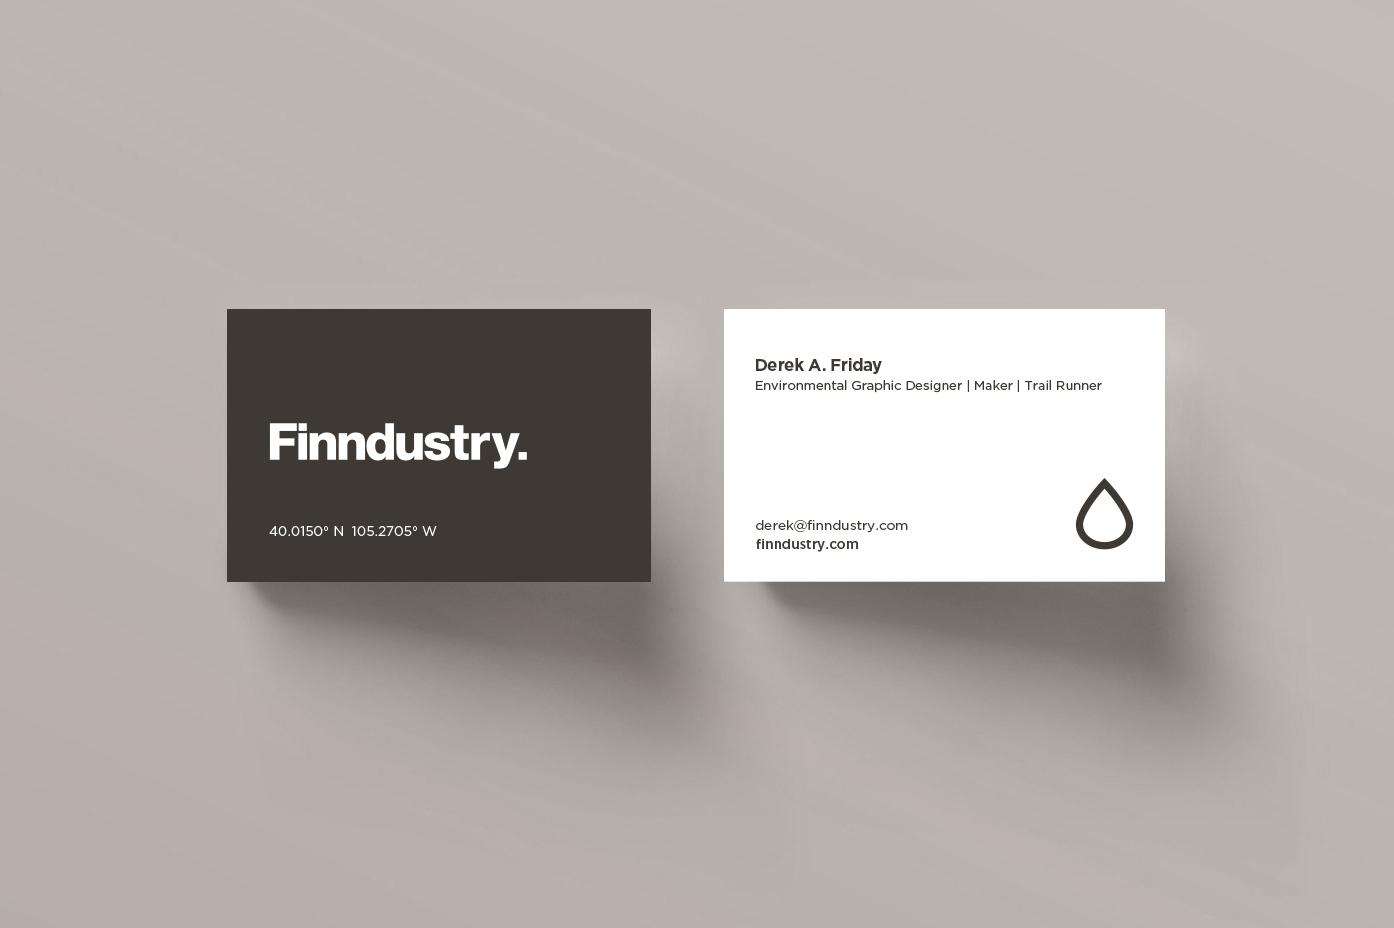 Environmental Graphic Designer  - finndustry | ello